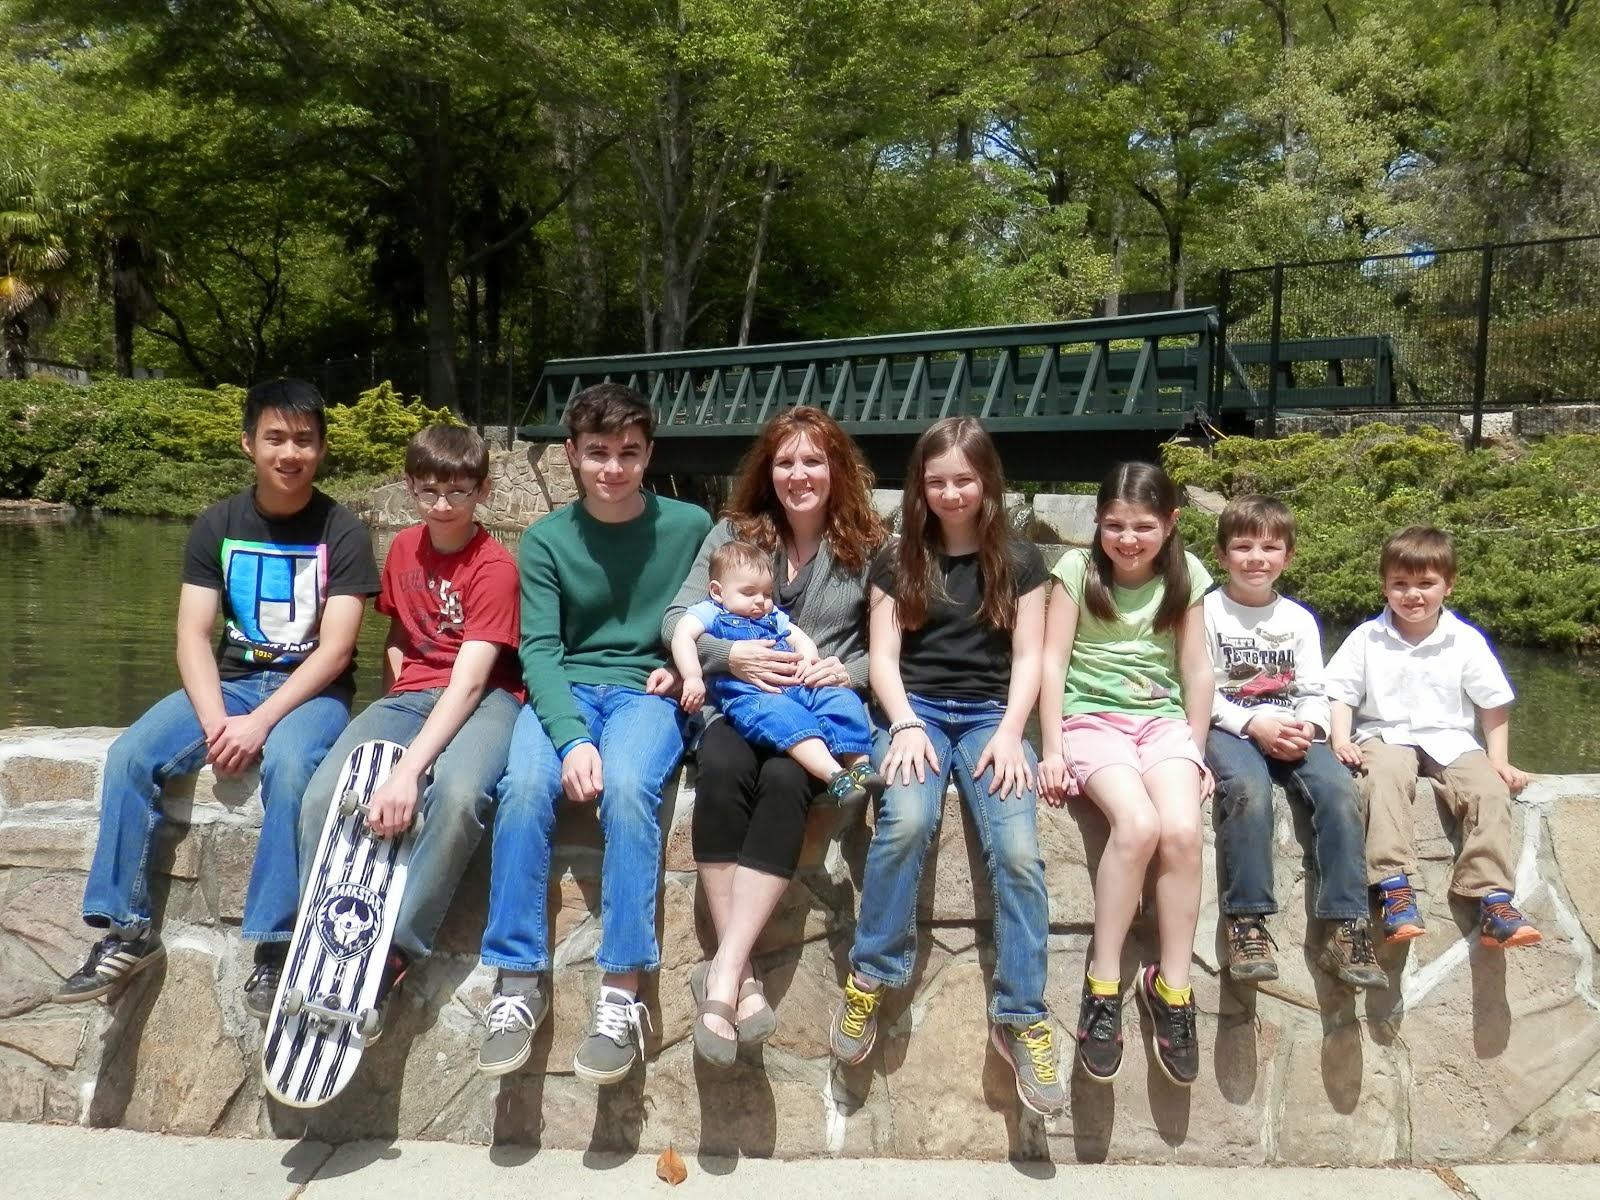 the Brelinsky bunch